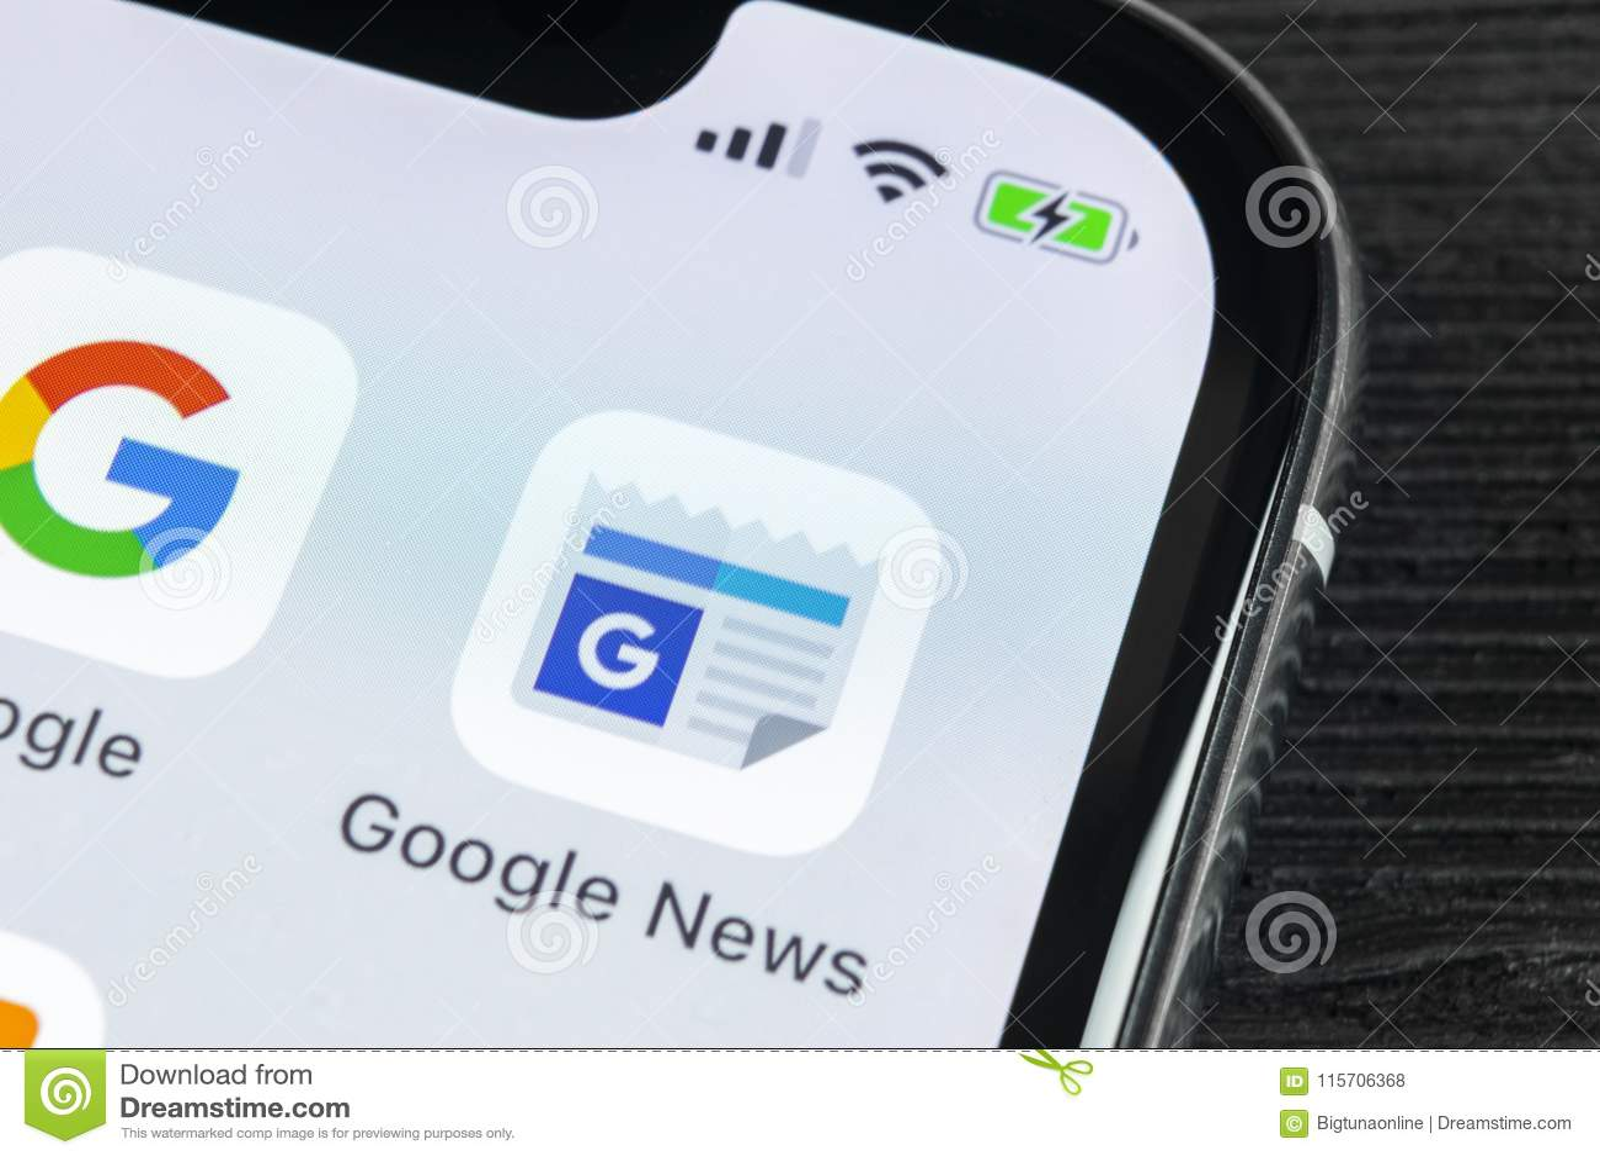 Google News Application Icon On Apple IPhone X Smartphone